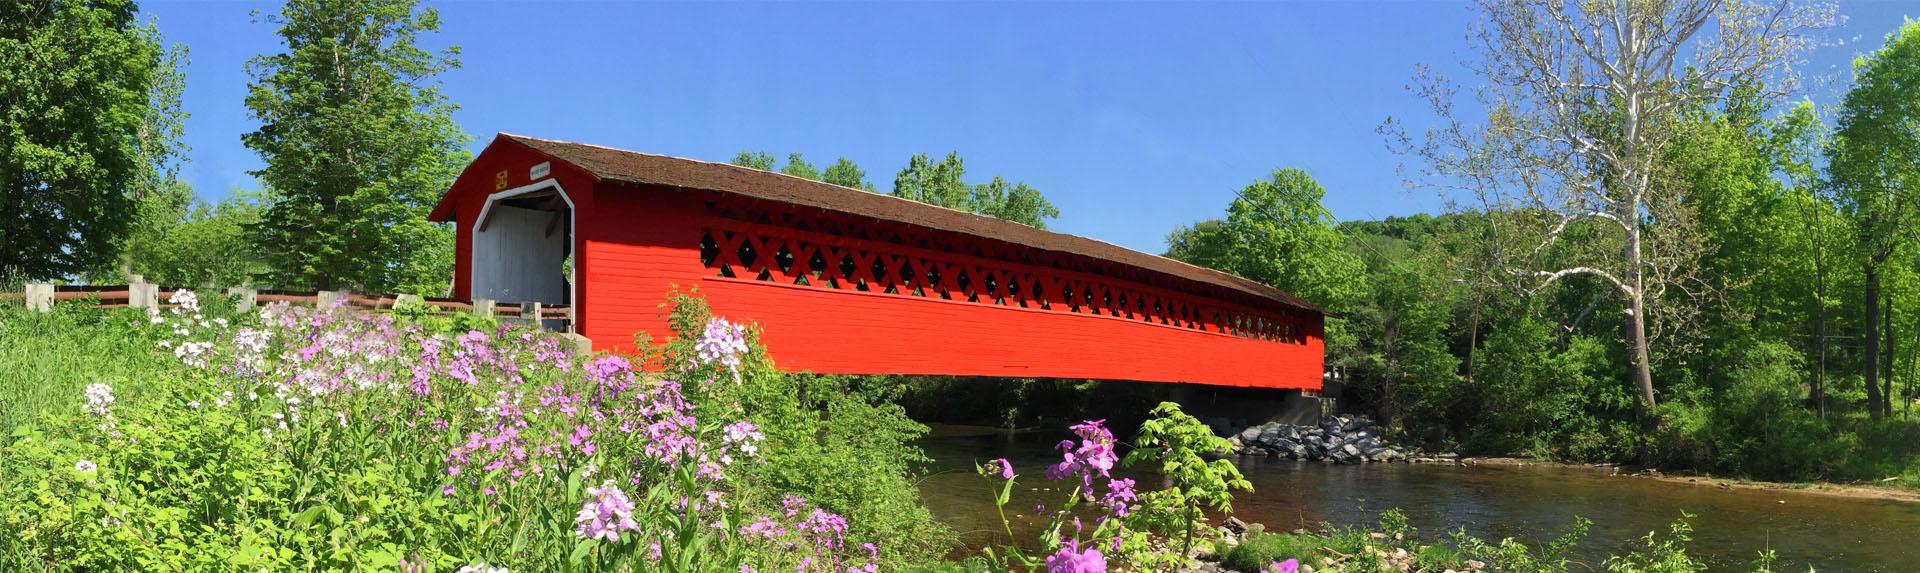 Bennington Covered Bridge